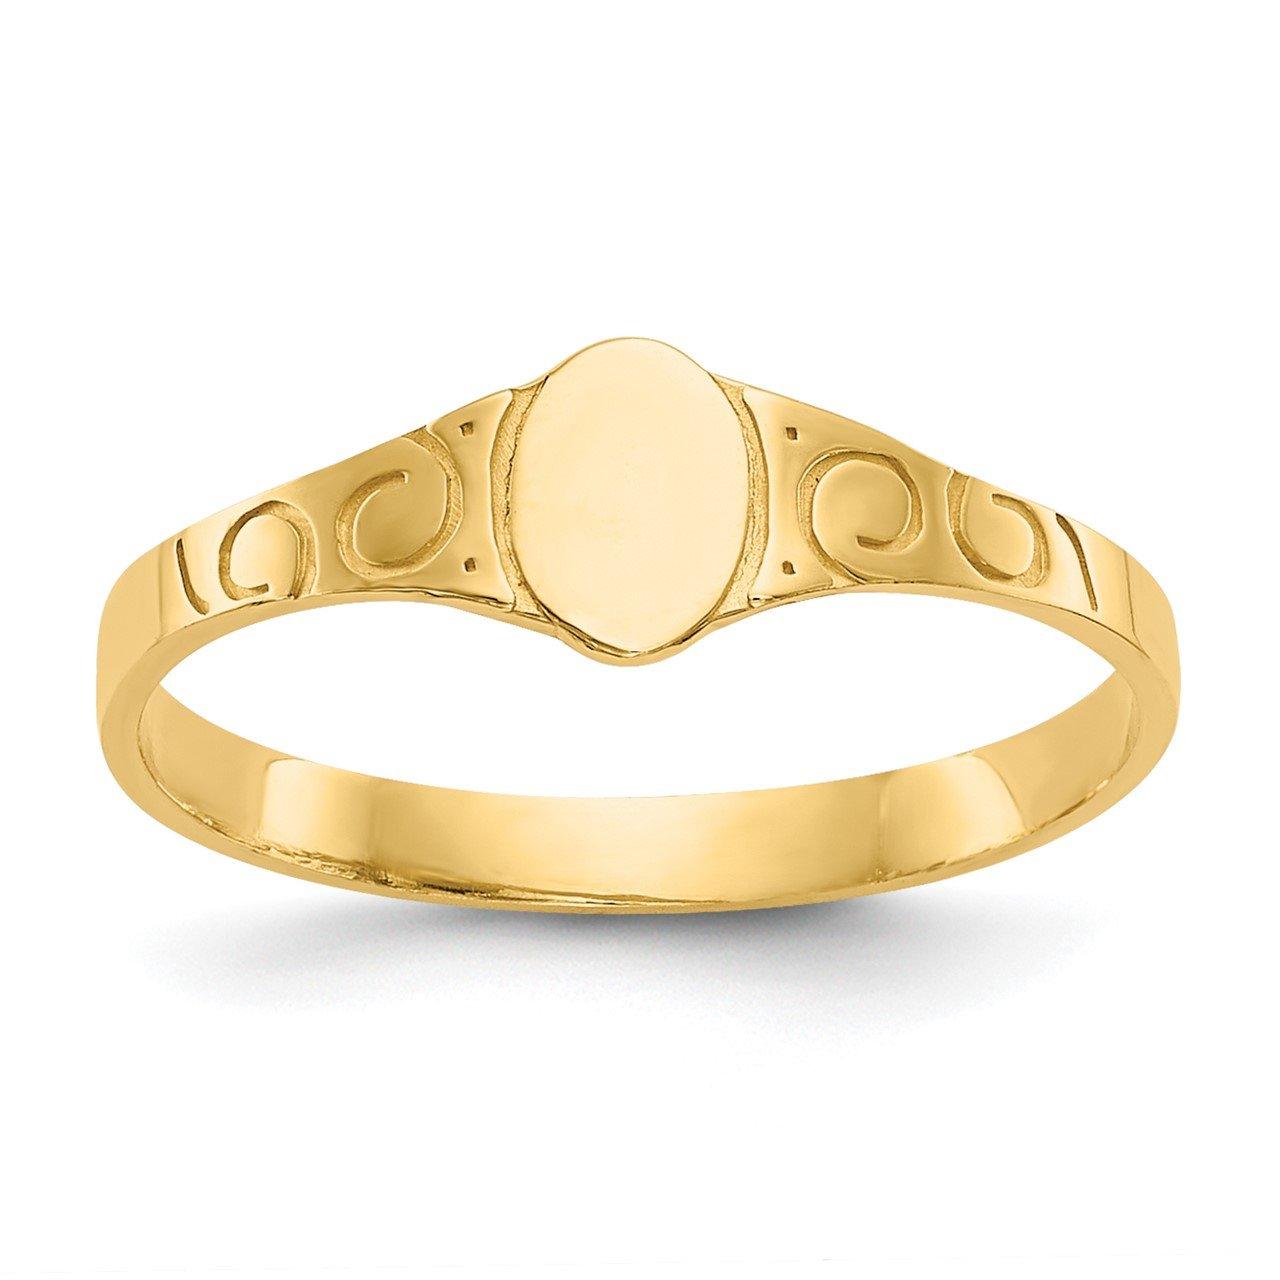 14k Polished Oval Baby Signet Ring